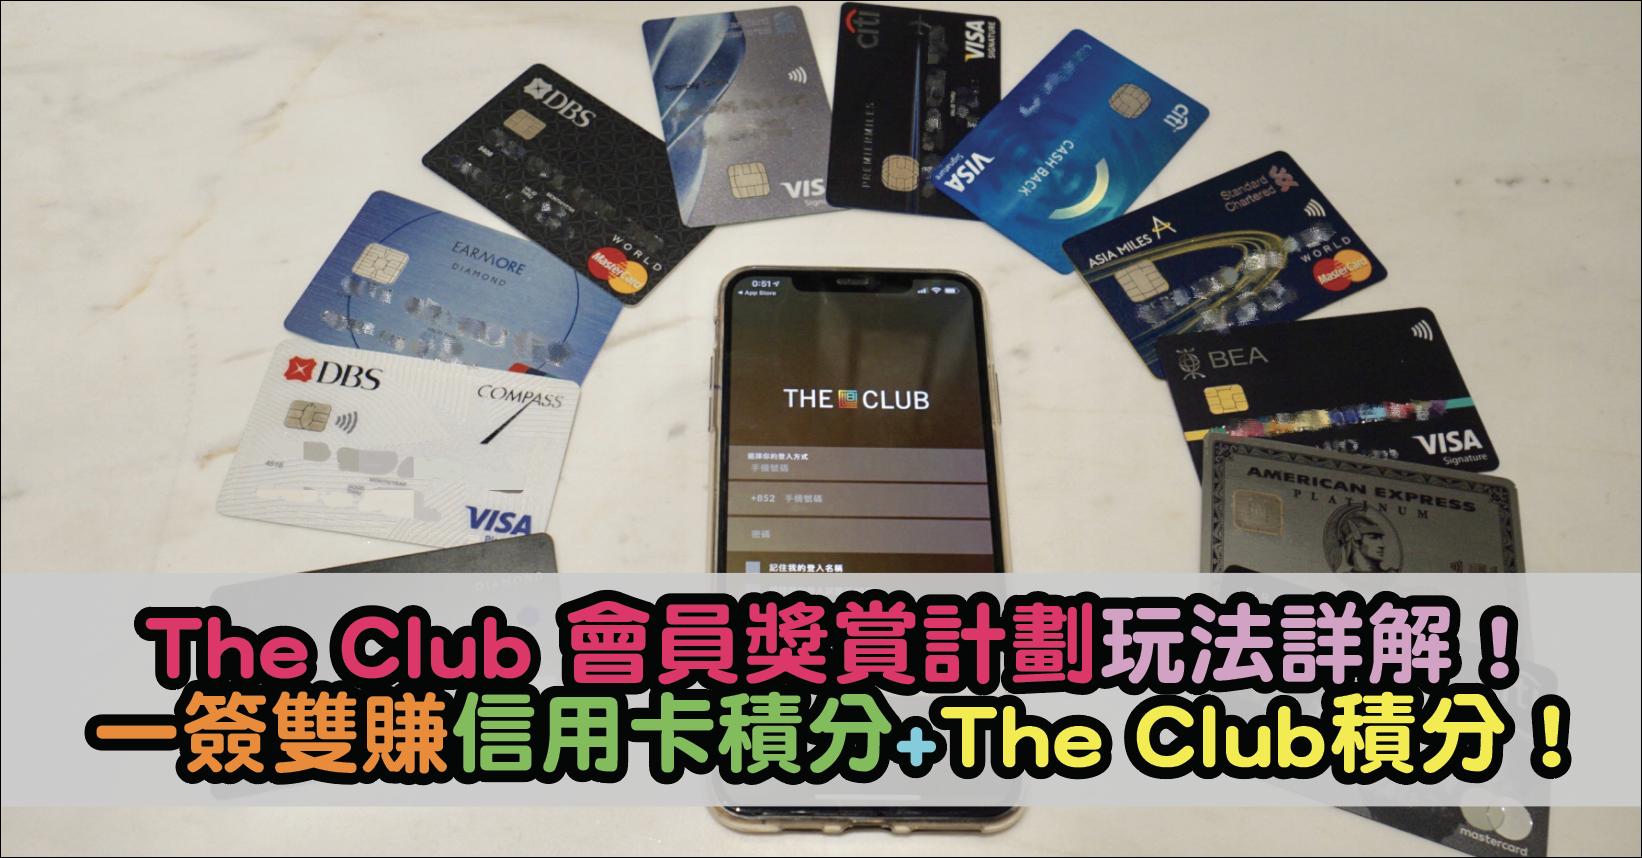 The Club 會員獎賞計劃玩法詳解!一簽雙賺信用卡積分 + The Club積分,咁就可以免費兌換禮品啦!